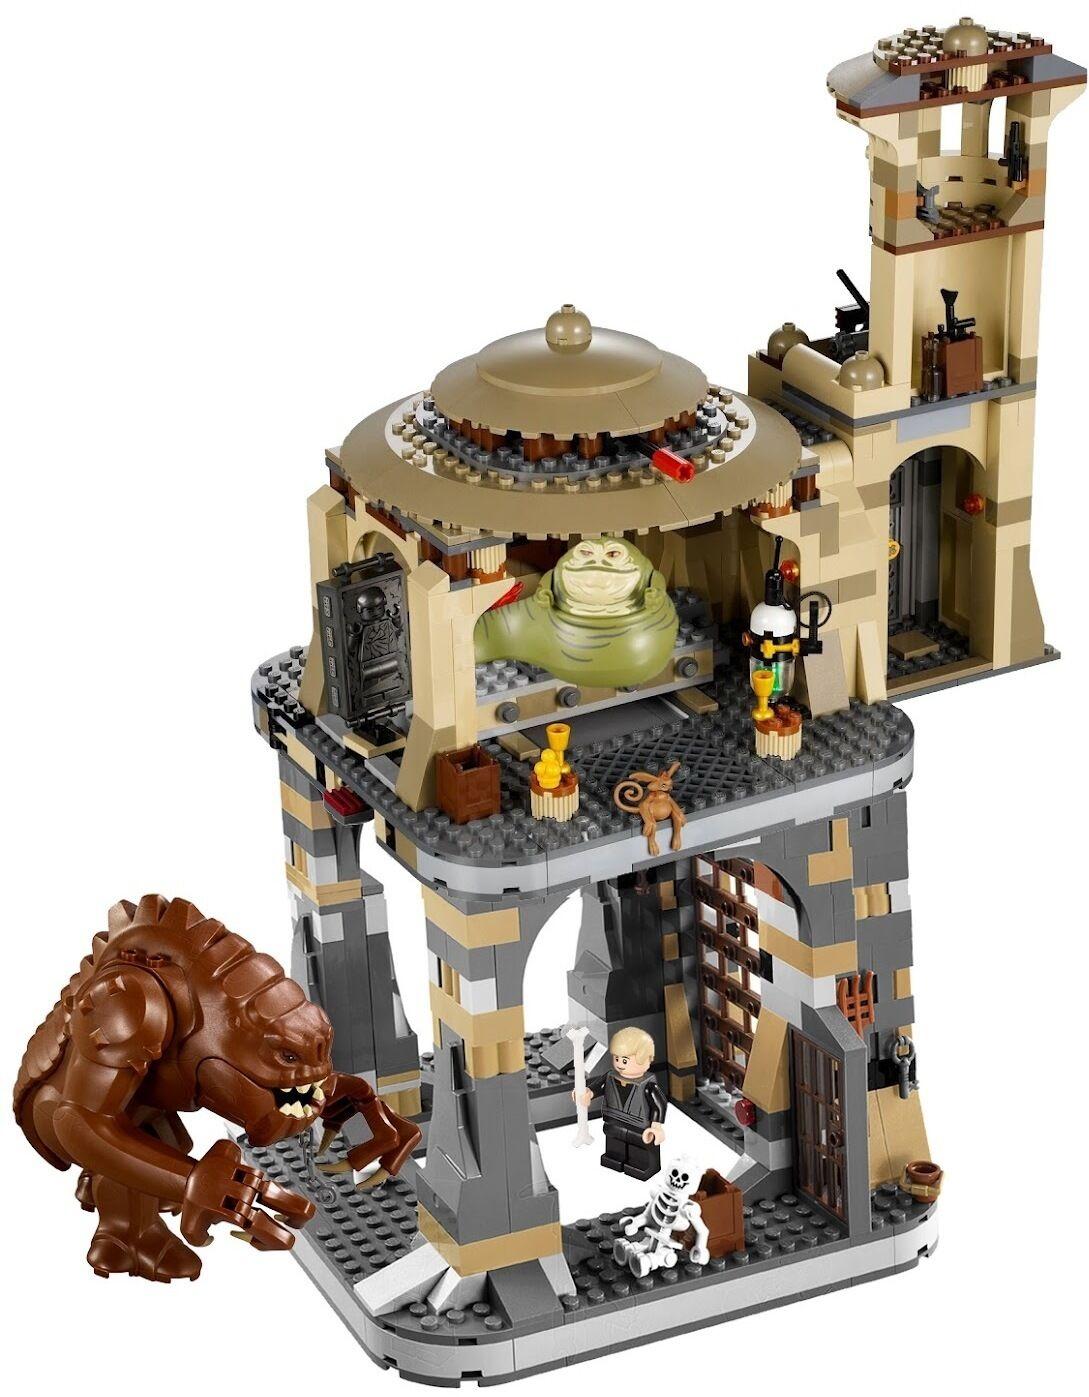 RETIrosso - BRAND NEW Lego Star Wars Jabba's Palace  9516  & Rancor Pit  75005